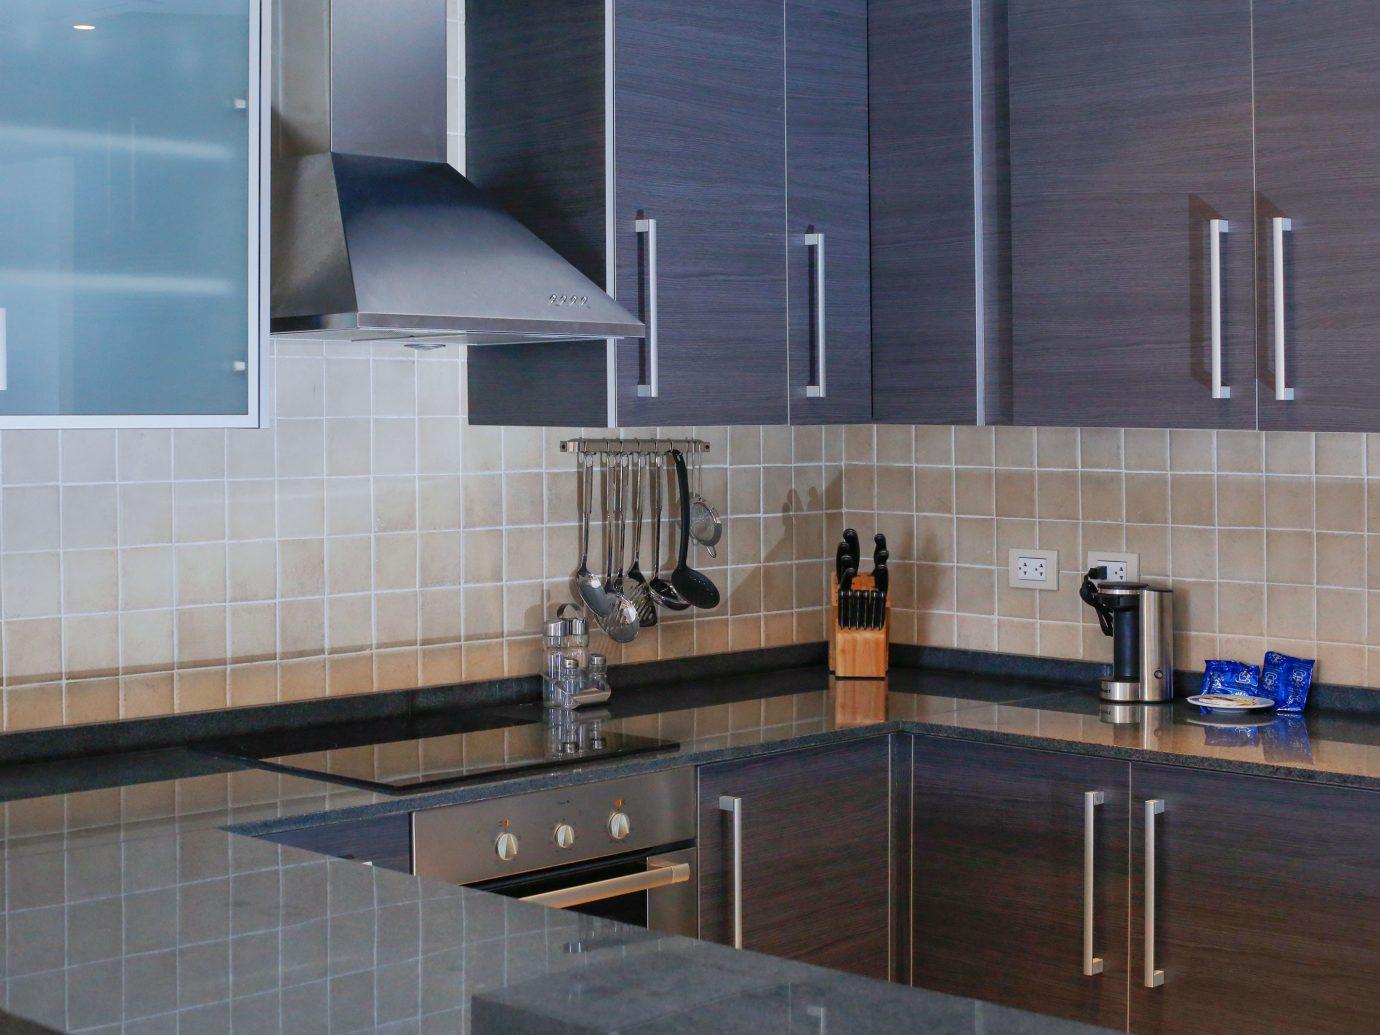 Hotels indoor wall room property floor tile flooring interior design Design home daylighting counter real estate bathroom apartment estate